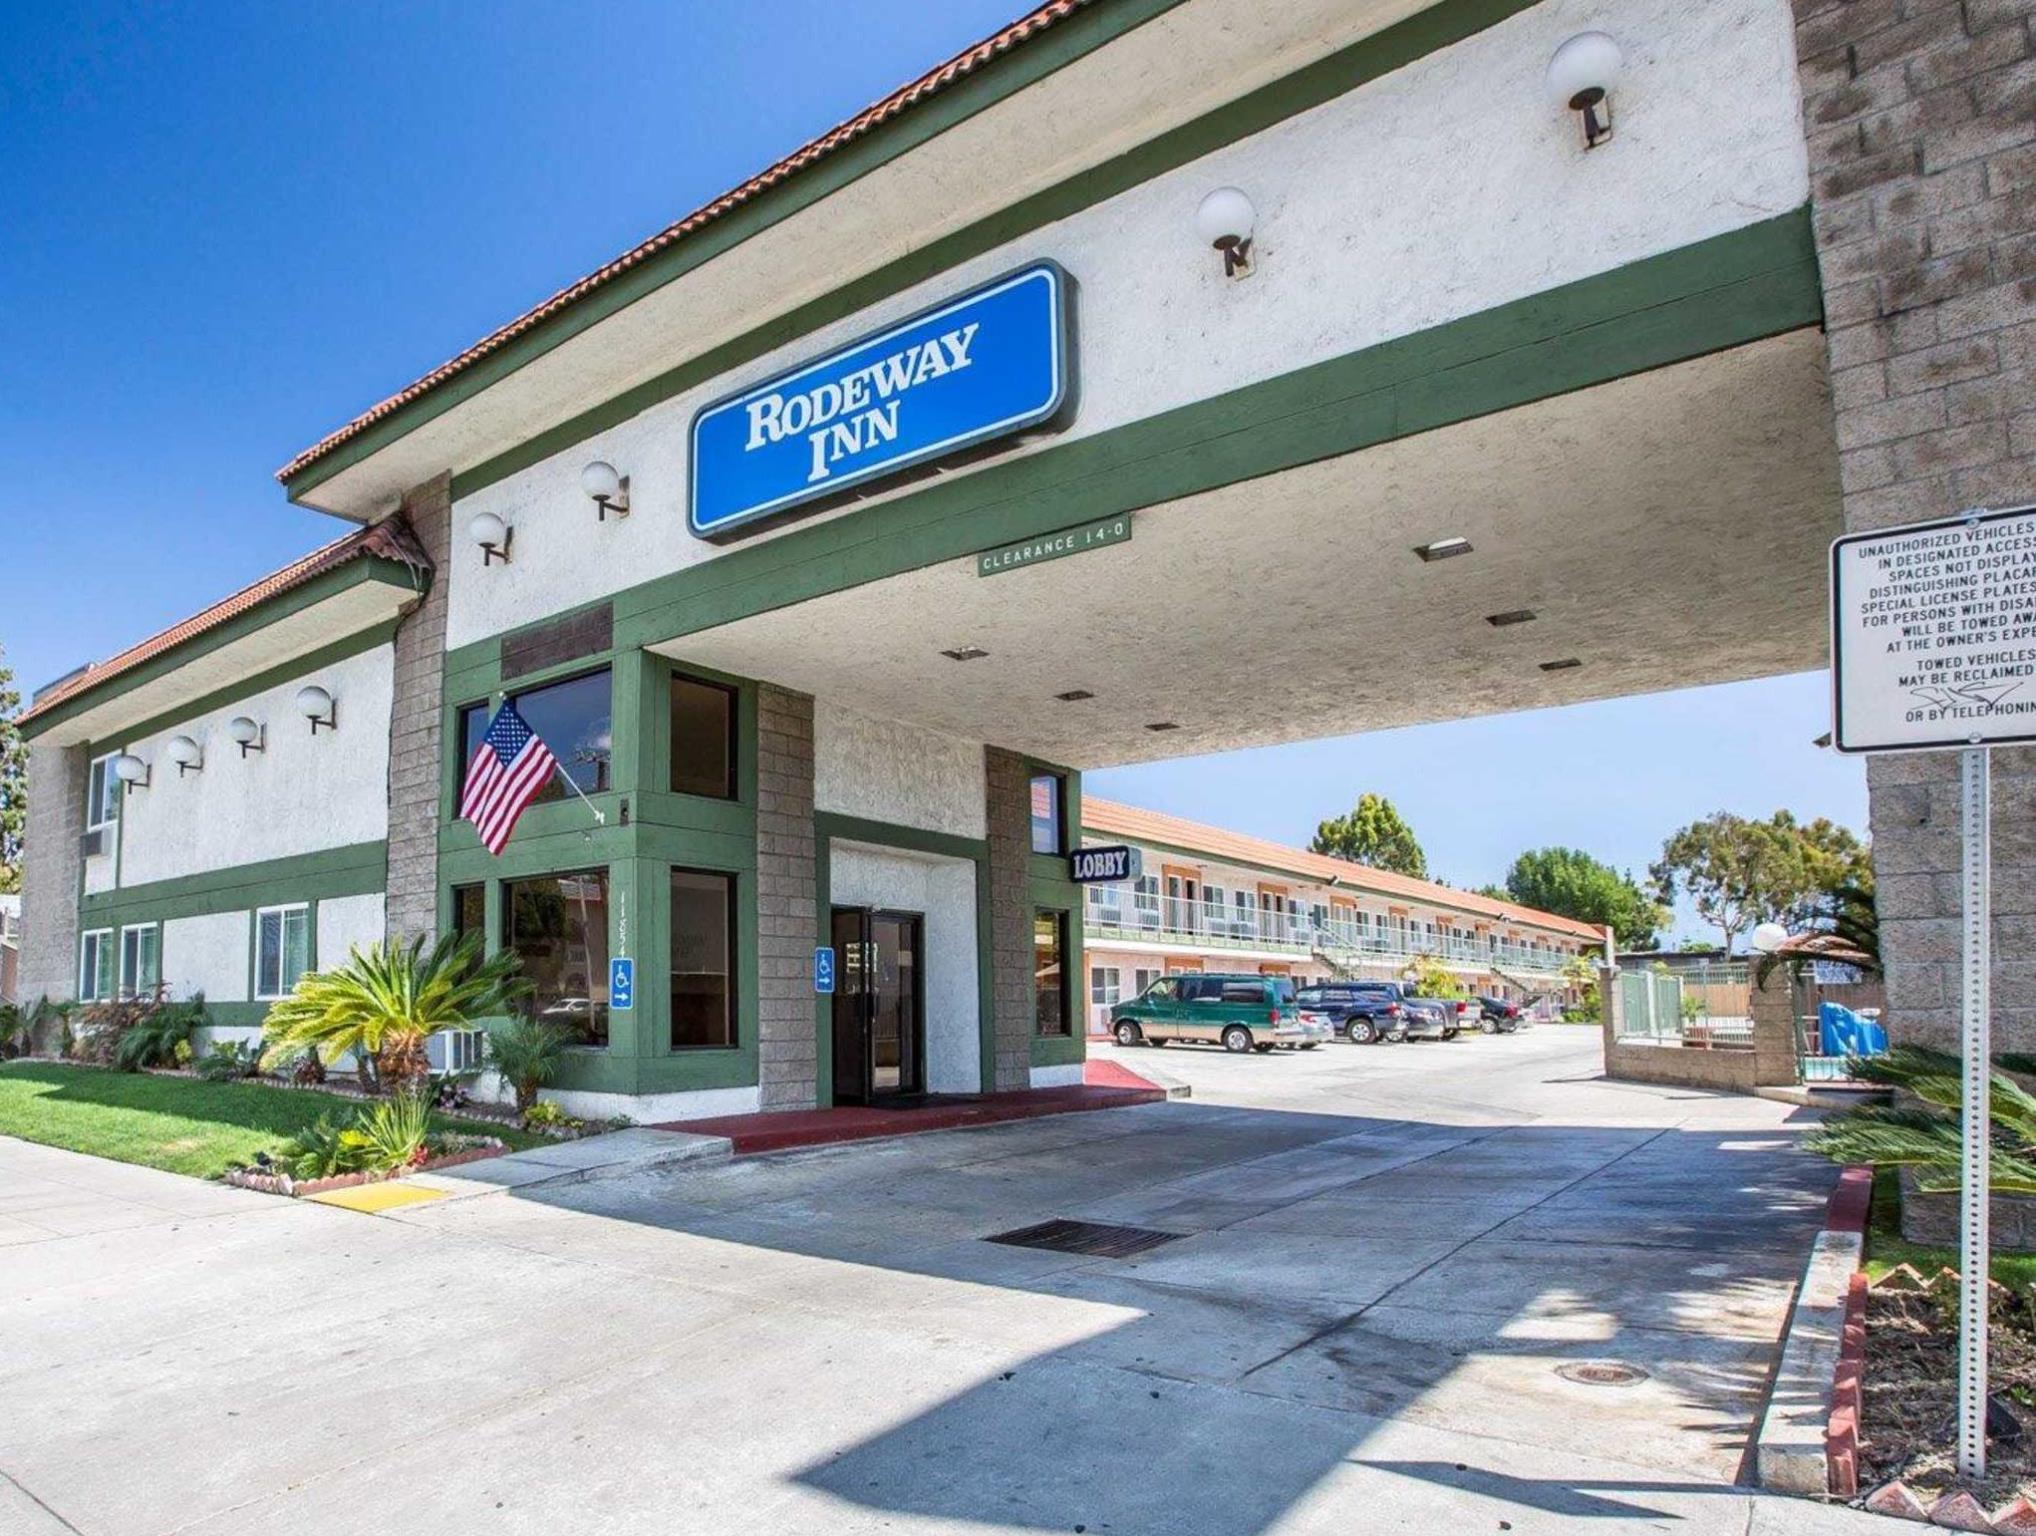 Rodeway Inn Artesia Los Angeles Ca United States